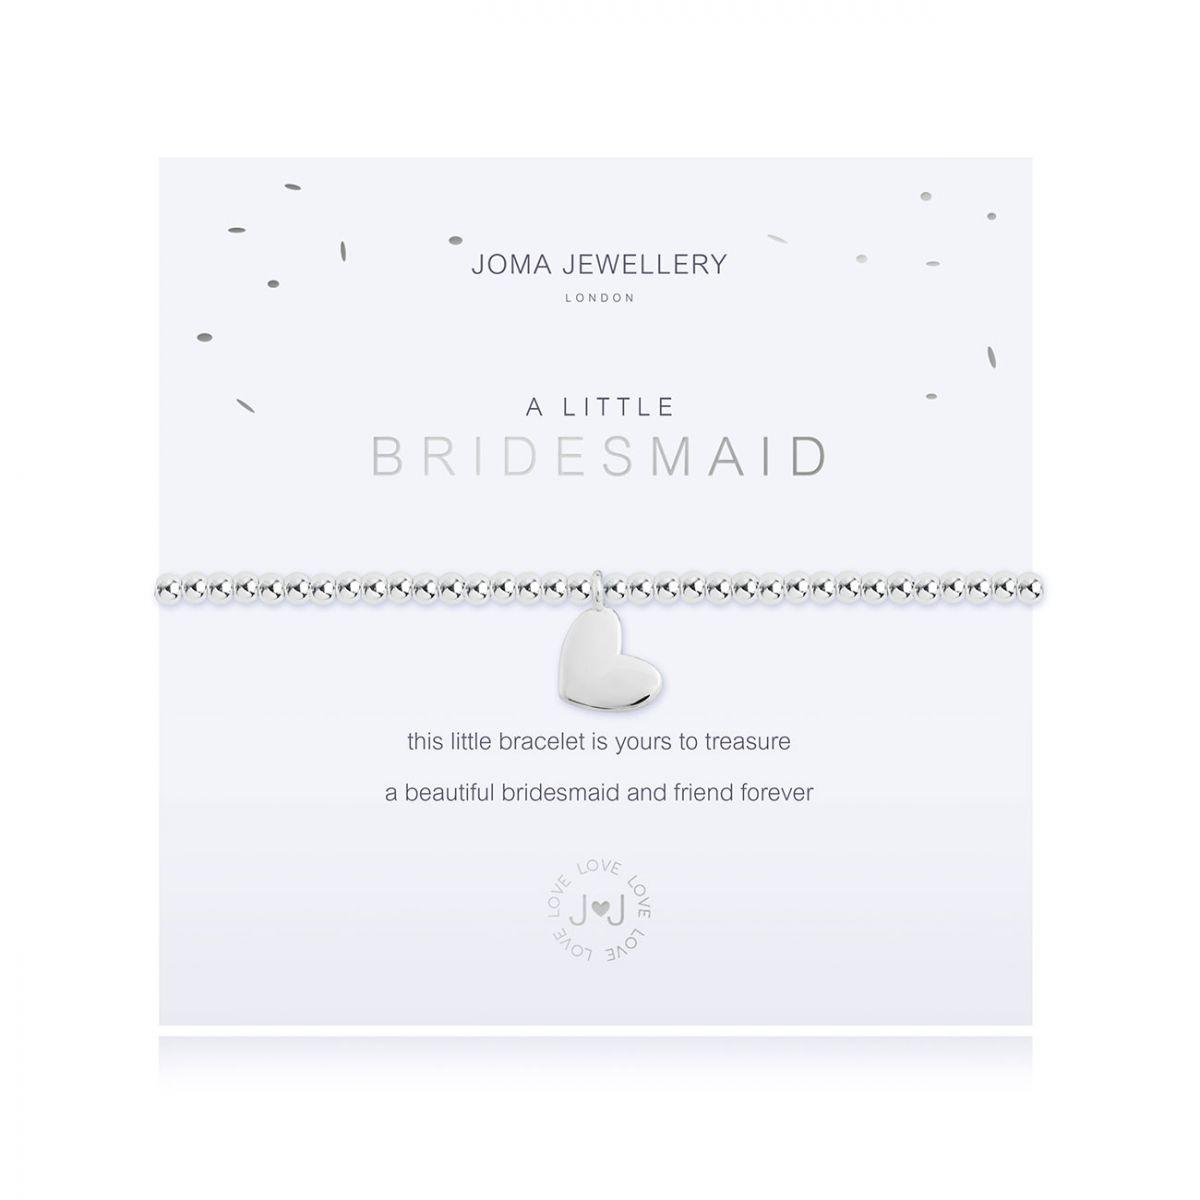 Joma Jewellery A Little 'Bridesmaid' Bracelet